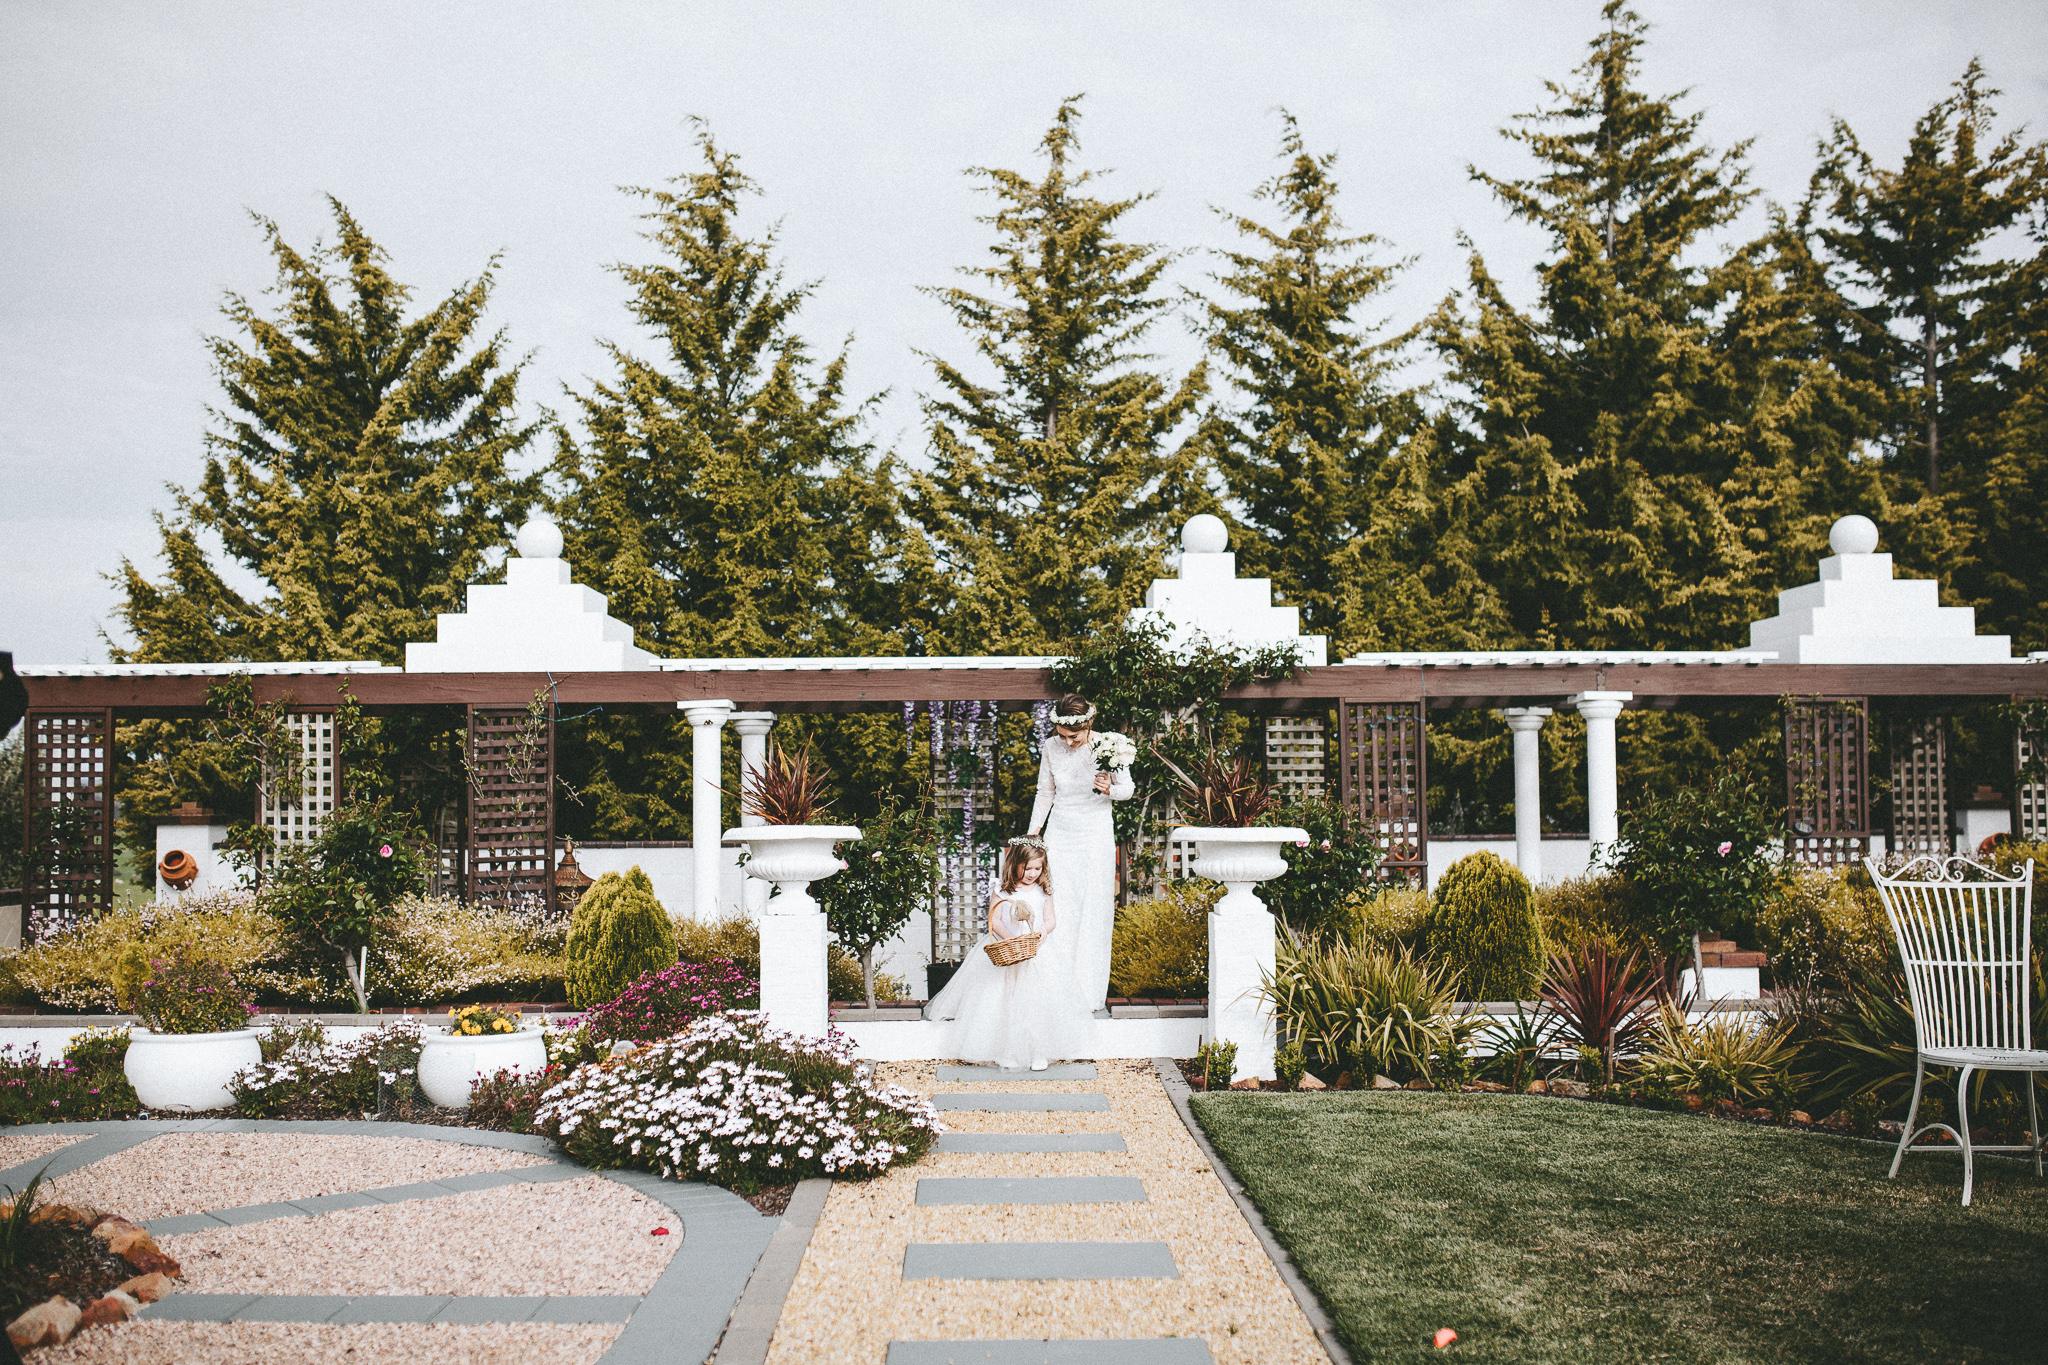 christopher morrison_adelaide hills wedding_ andy + teegan_42_9686.jpg